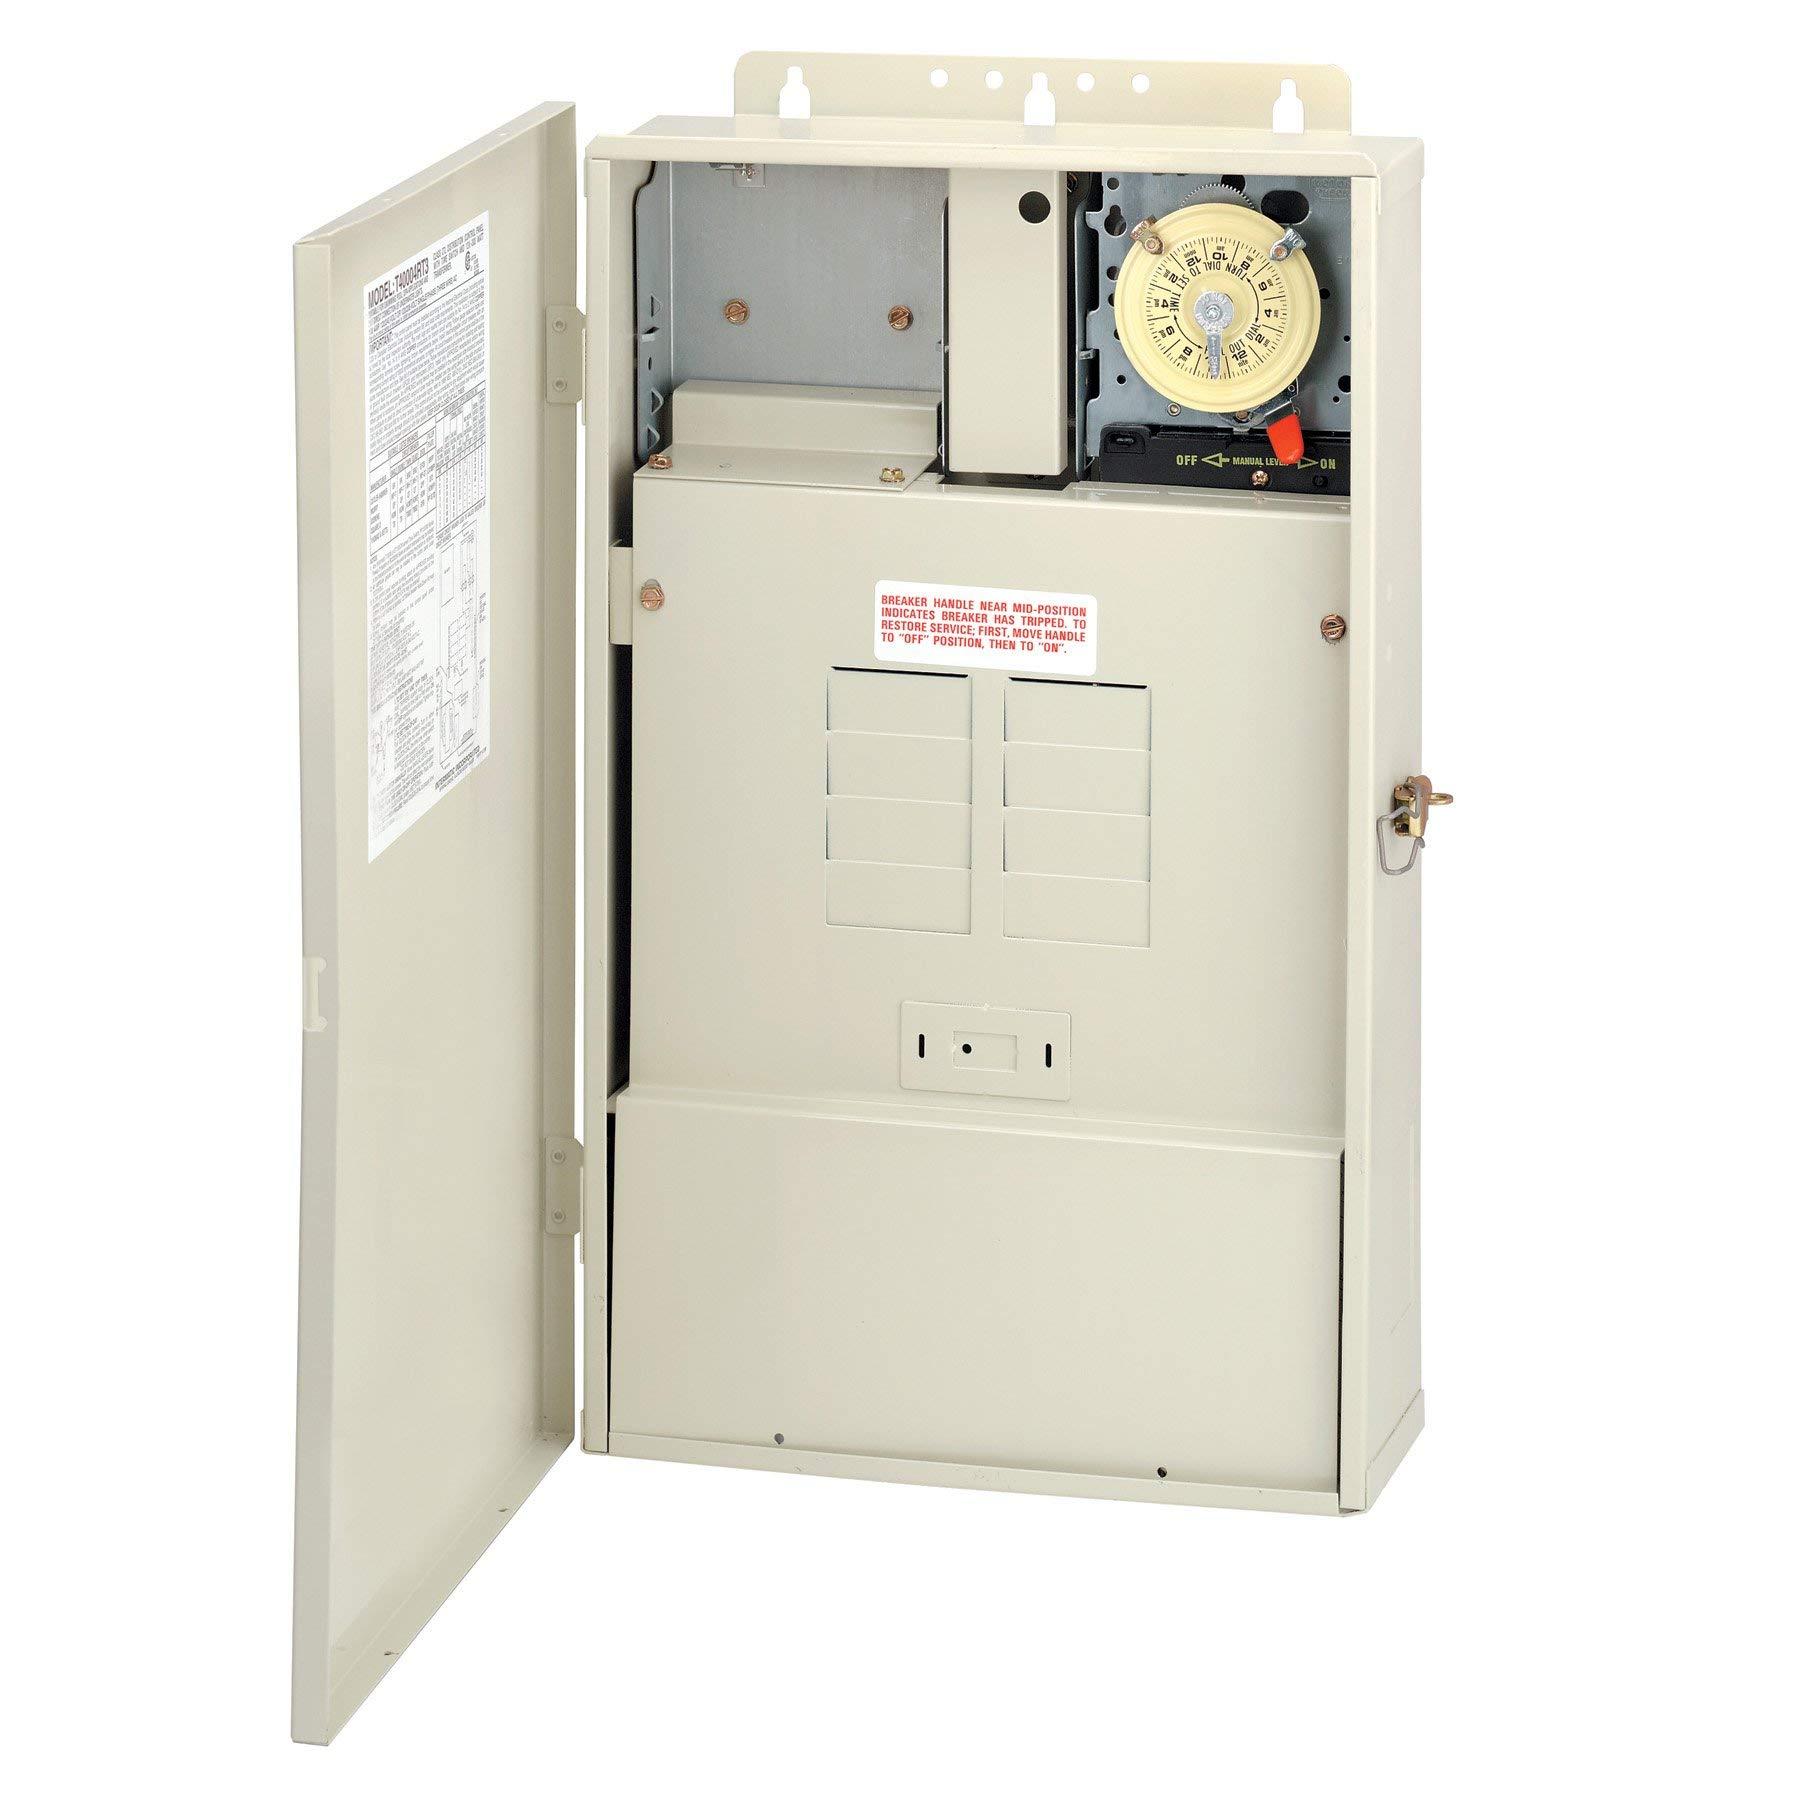 Intermatic T40004RT3 Pool Panel with Transformer 300-Watt (Renewed) by Intermatic